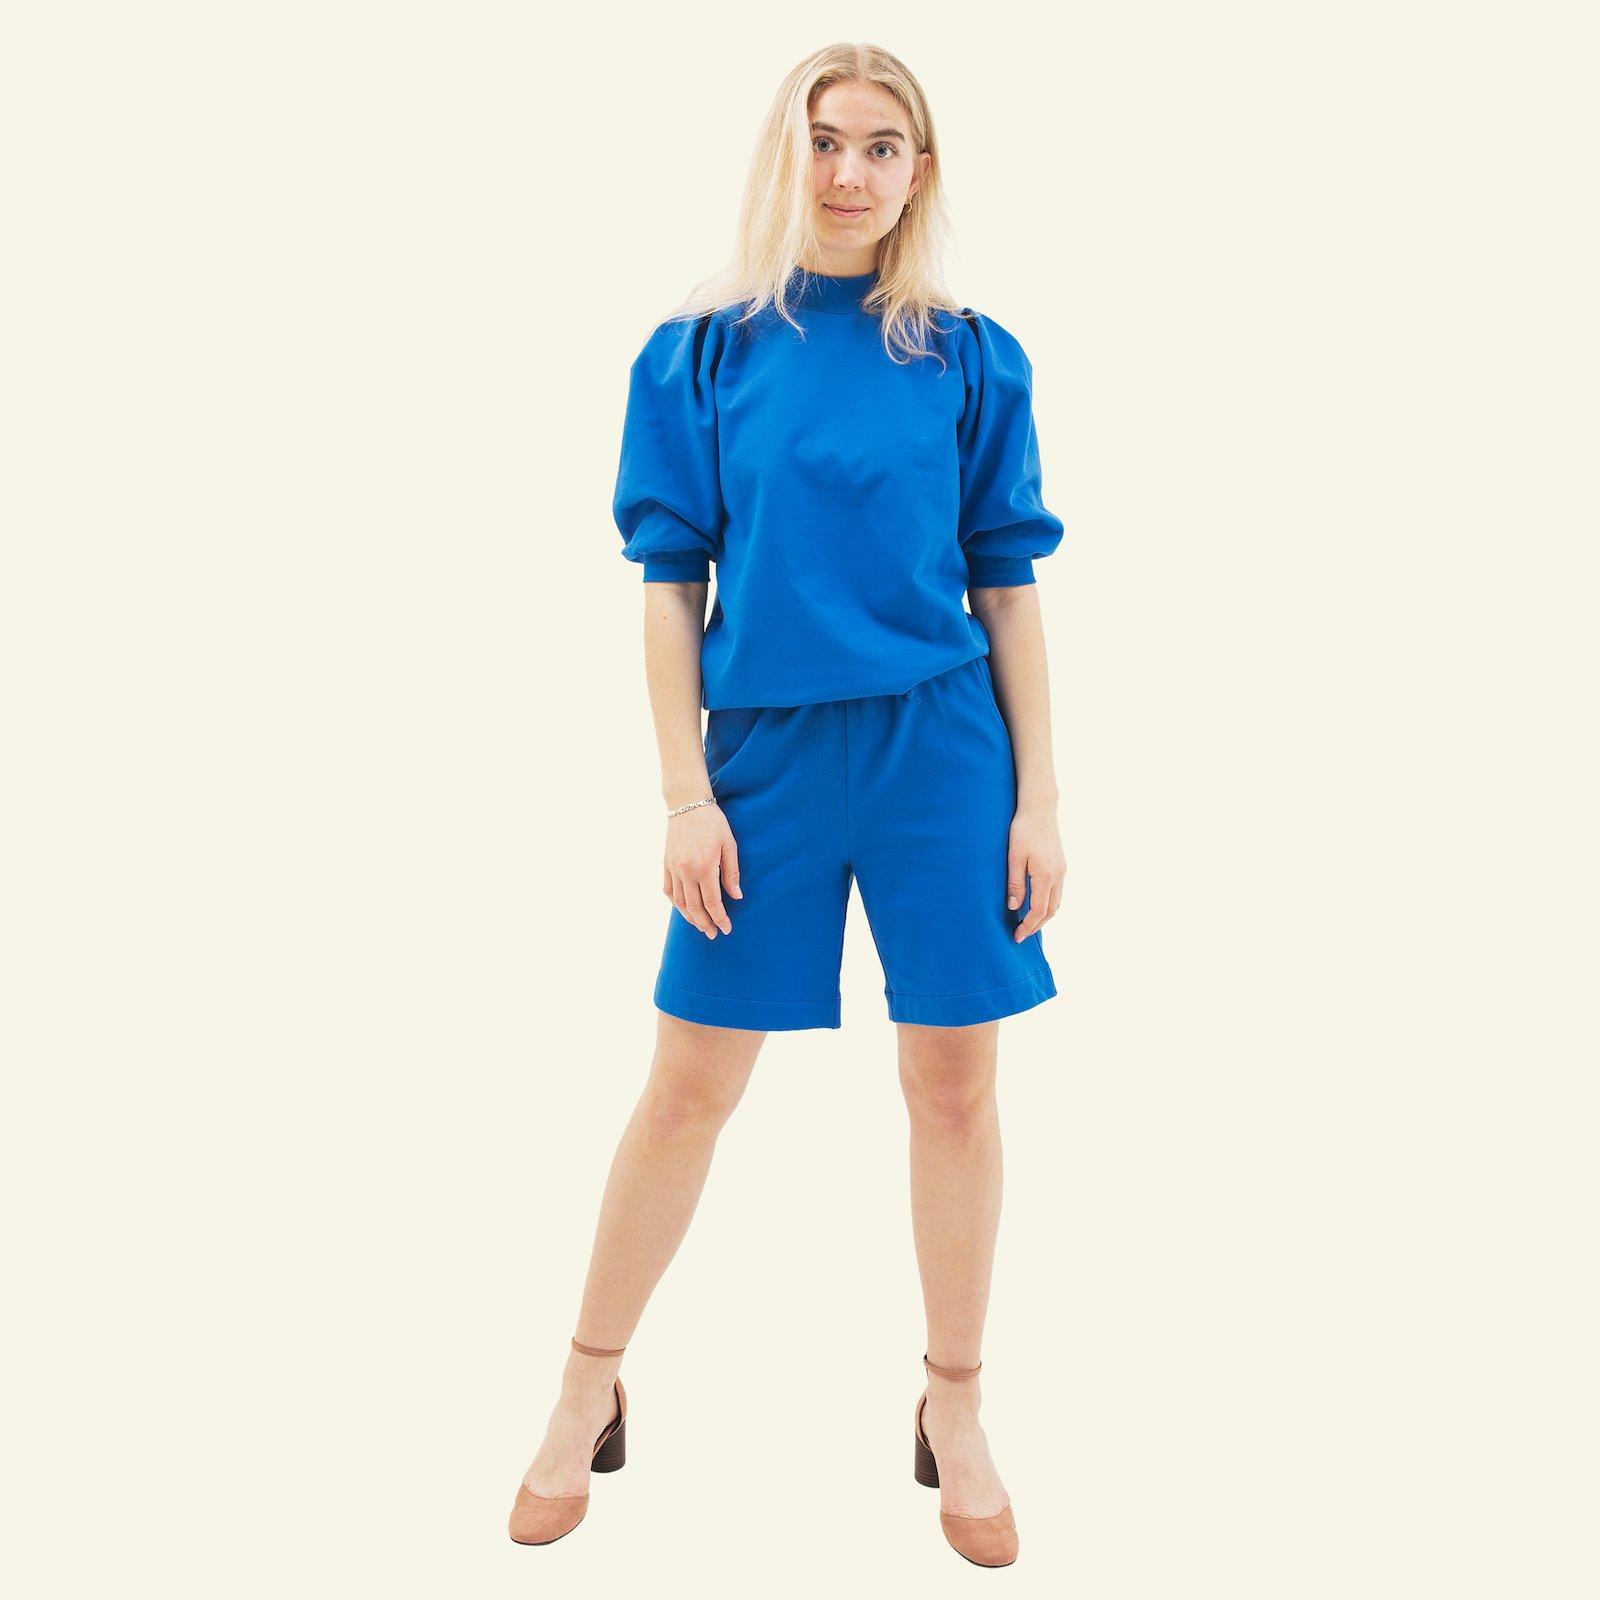 Organic french terry cobalt blue brushed p22074_p20051_211744_230604_bundle